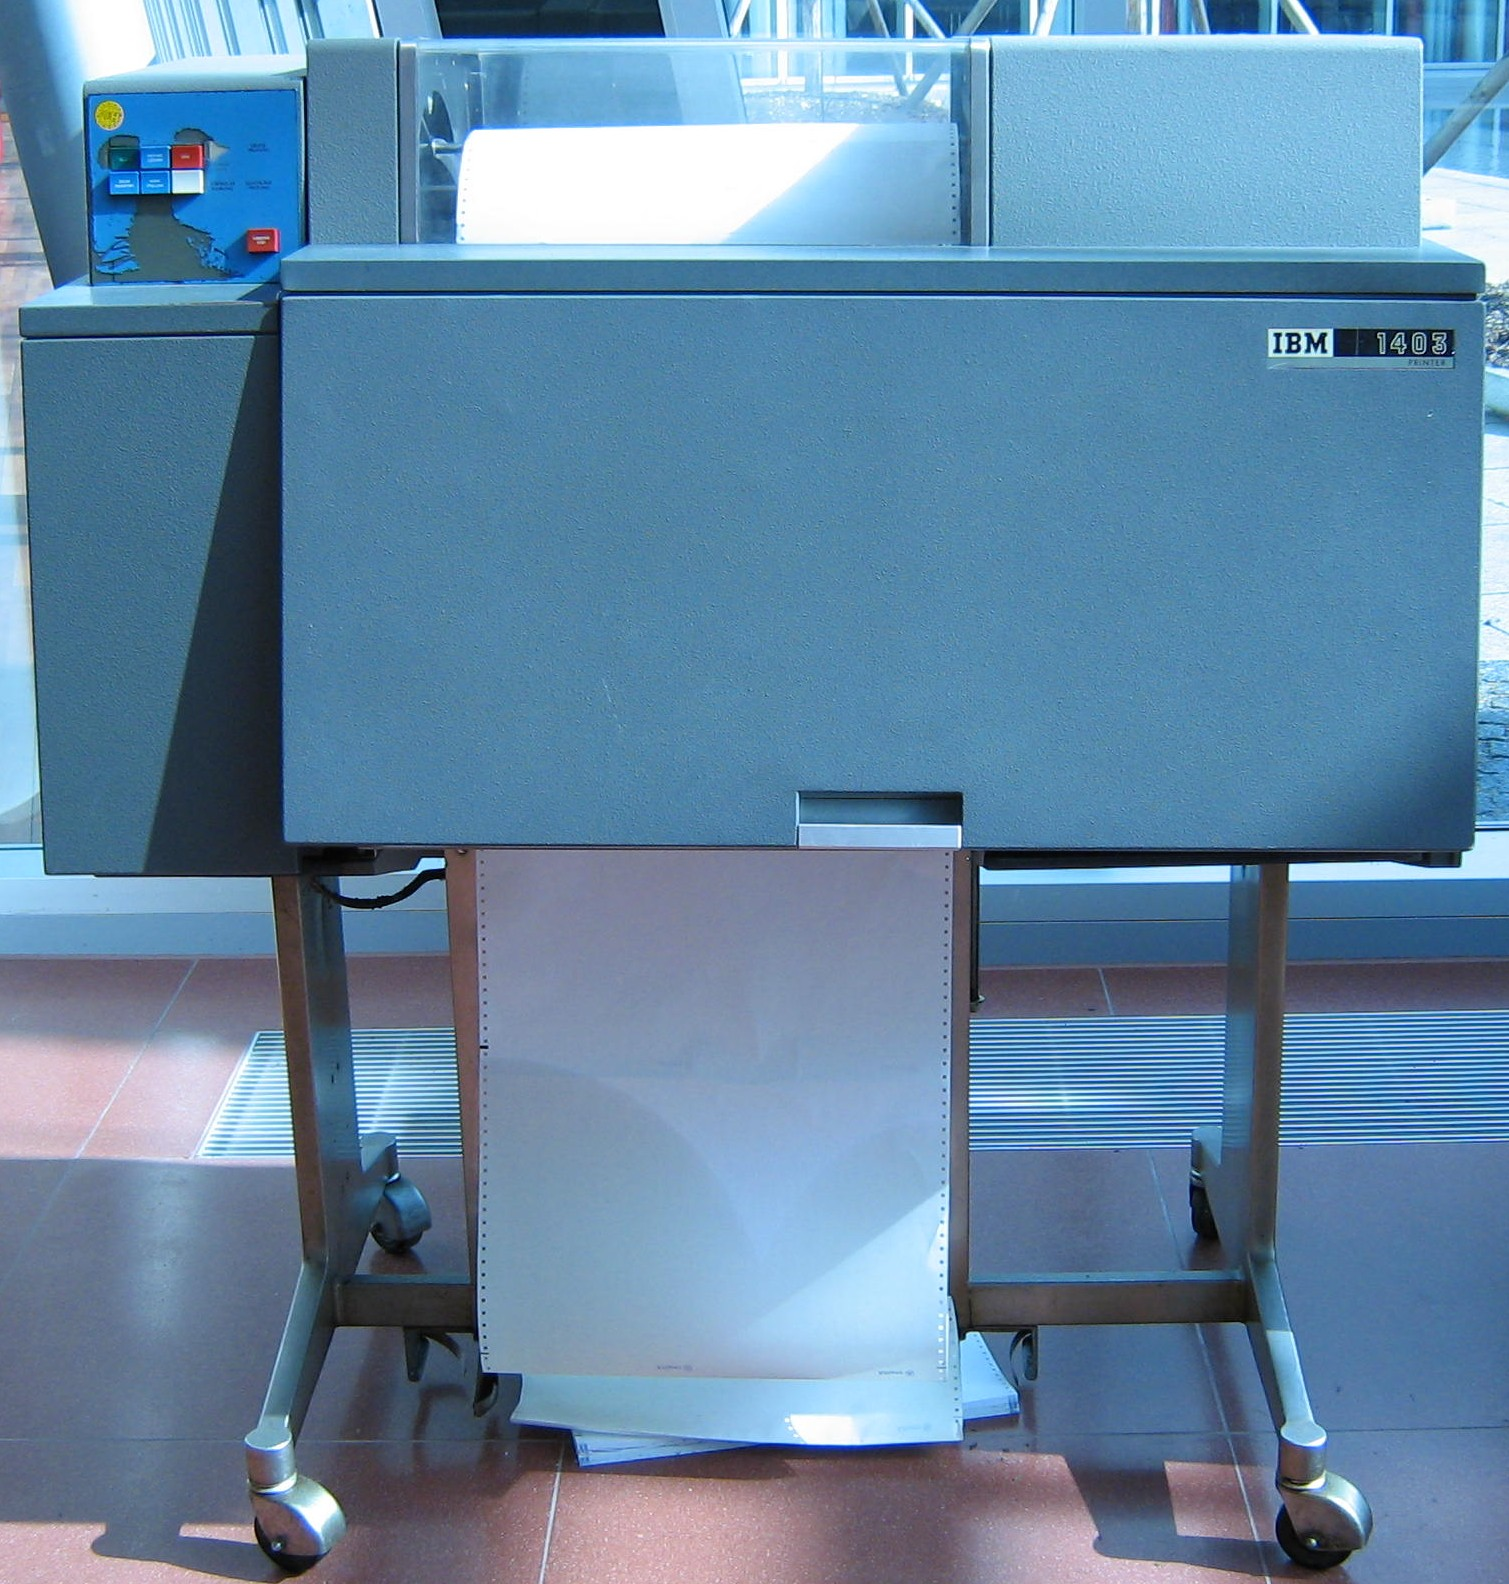 Line printer - Wikipedia